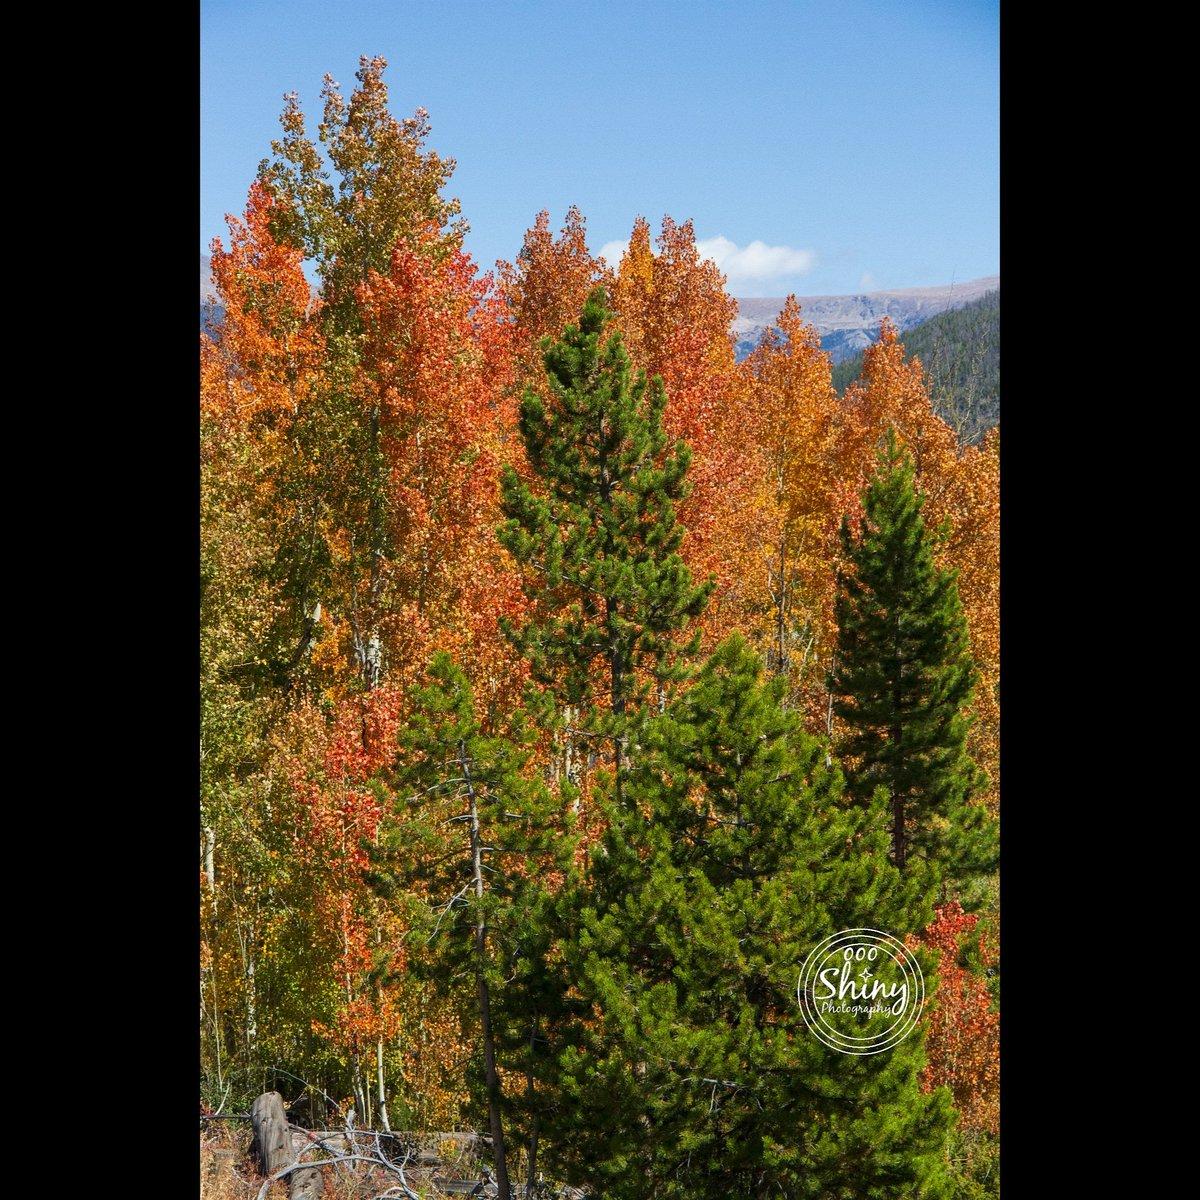 #Trees of #fall.9-22-19, near #GrandLake, #Colorado.#Canon 7D F/10 67mm 1/1600s ISO-1000#oooShinyPhotography #oooShinyPhotos #oooShiny#fallcolors #fallleaves #treephotography #autumncolors #autumnleaves #autumn #TeamCanon #photooftheday #CanonFavPic #MyCanonStory